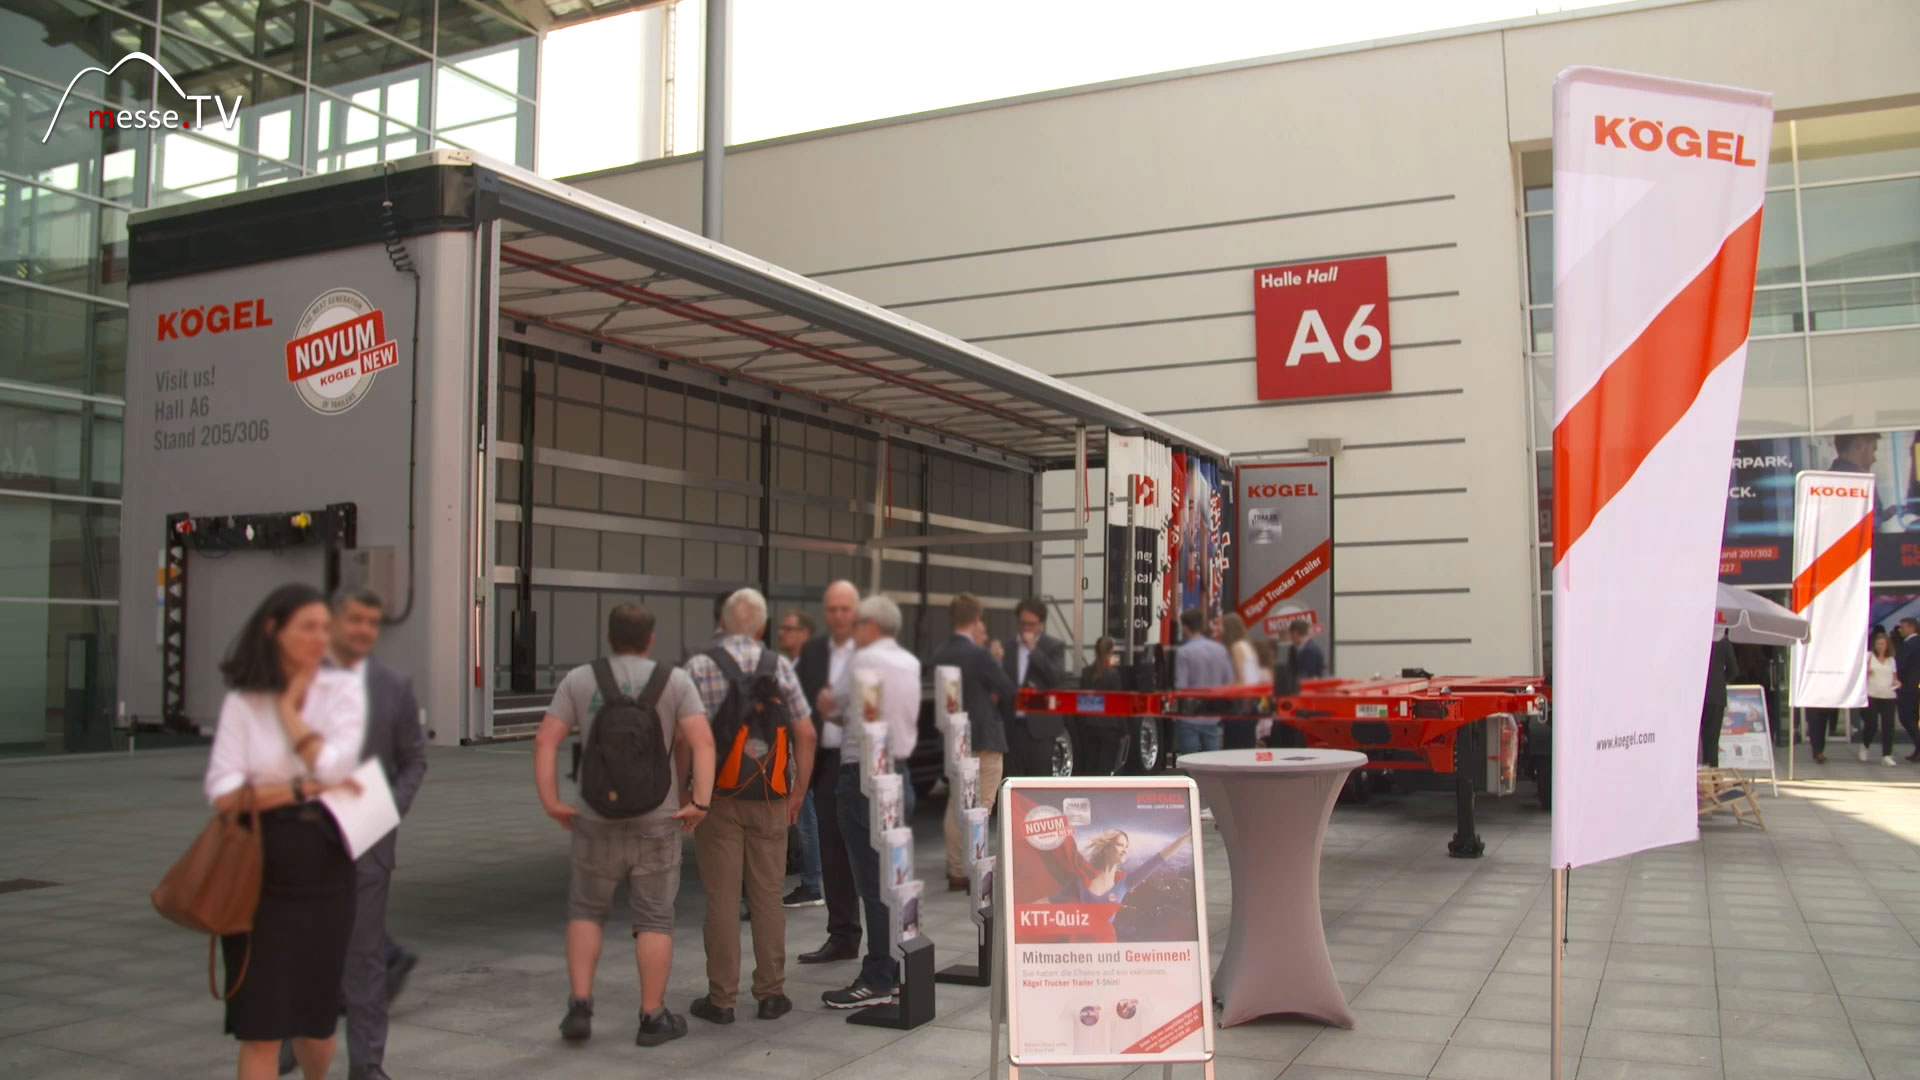 KÖGEL Trailer:  transport logistic 2019 Messe München